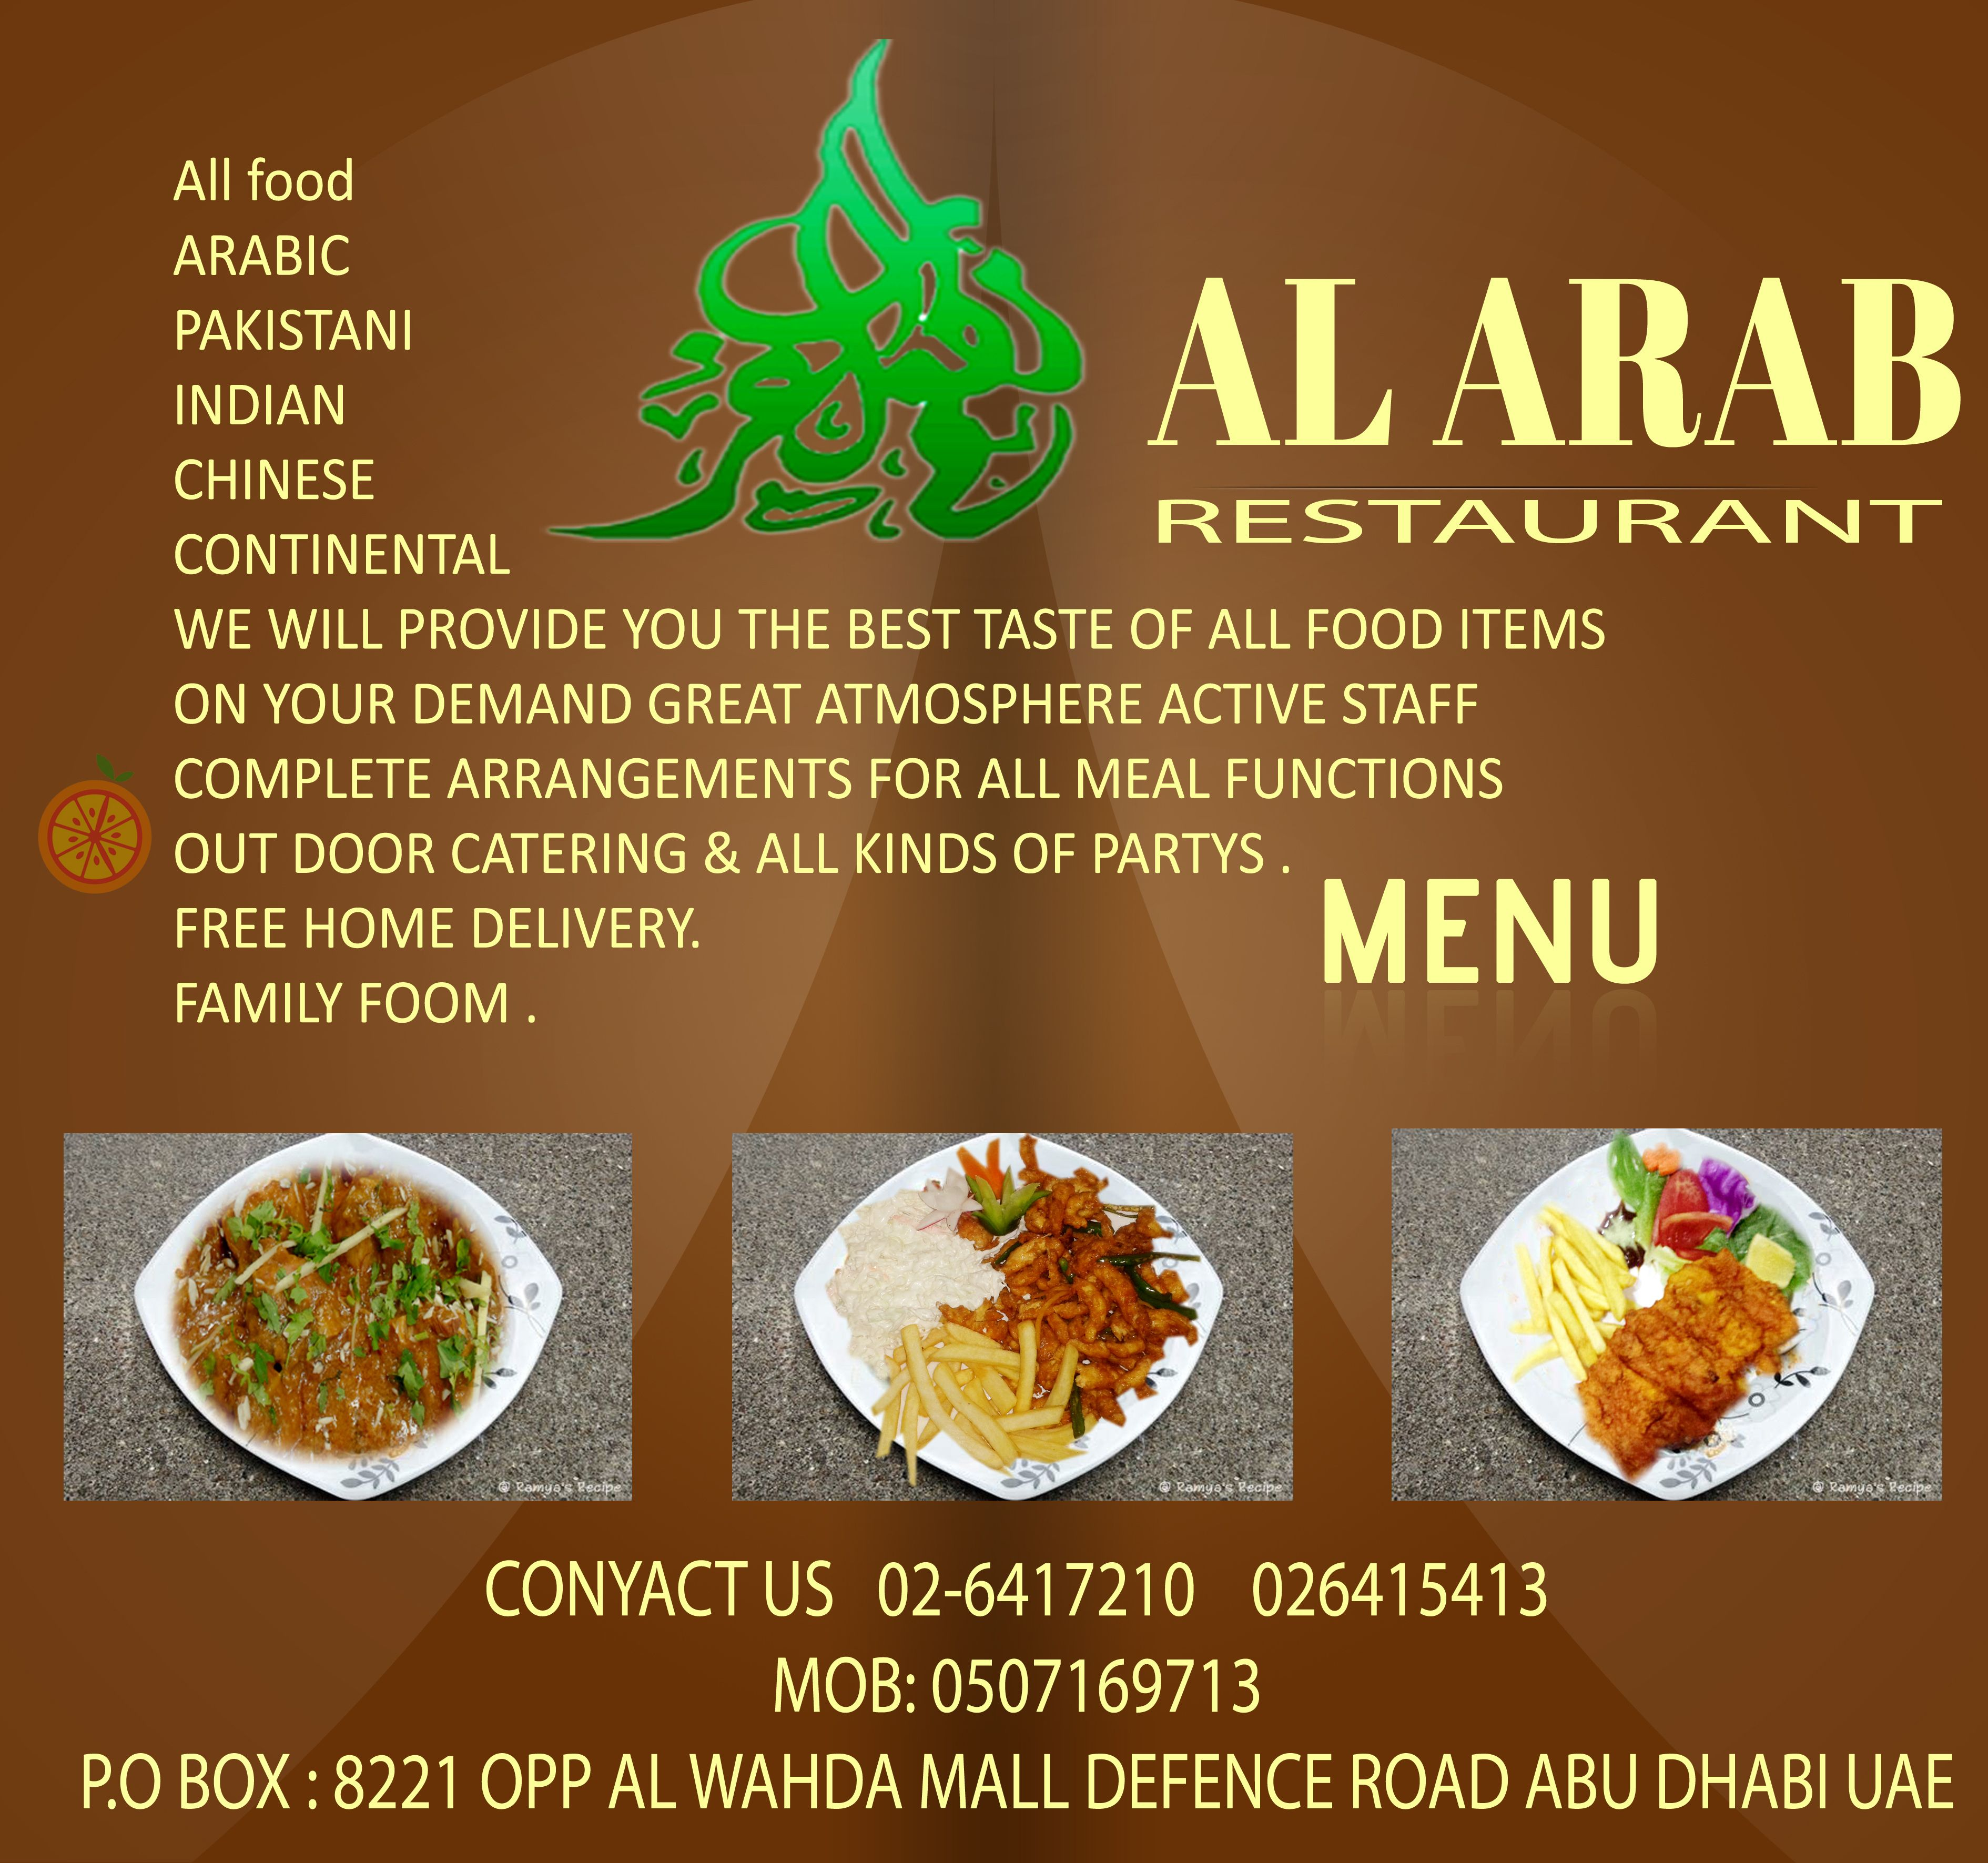 Pin By Alarabrestaurant On Al Arab Restaurant Food Items Food Meals